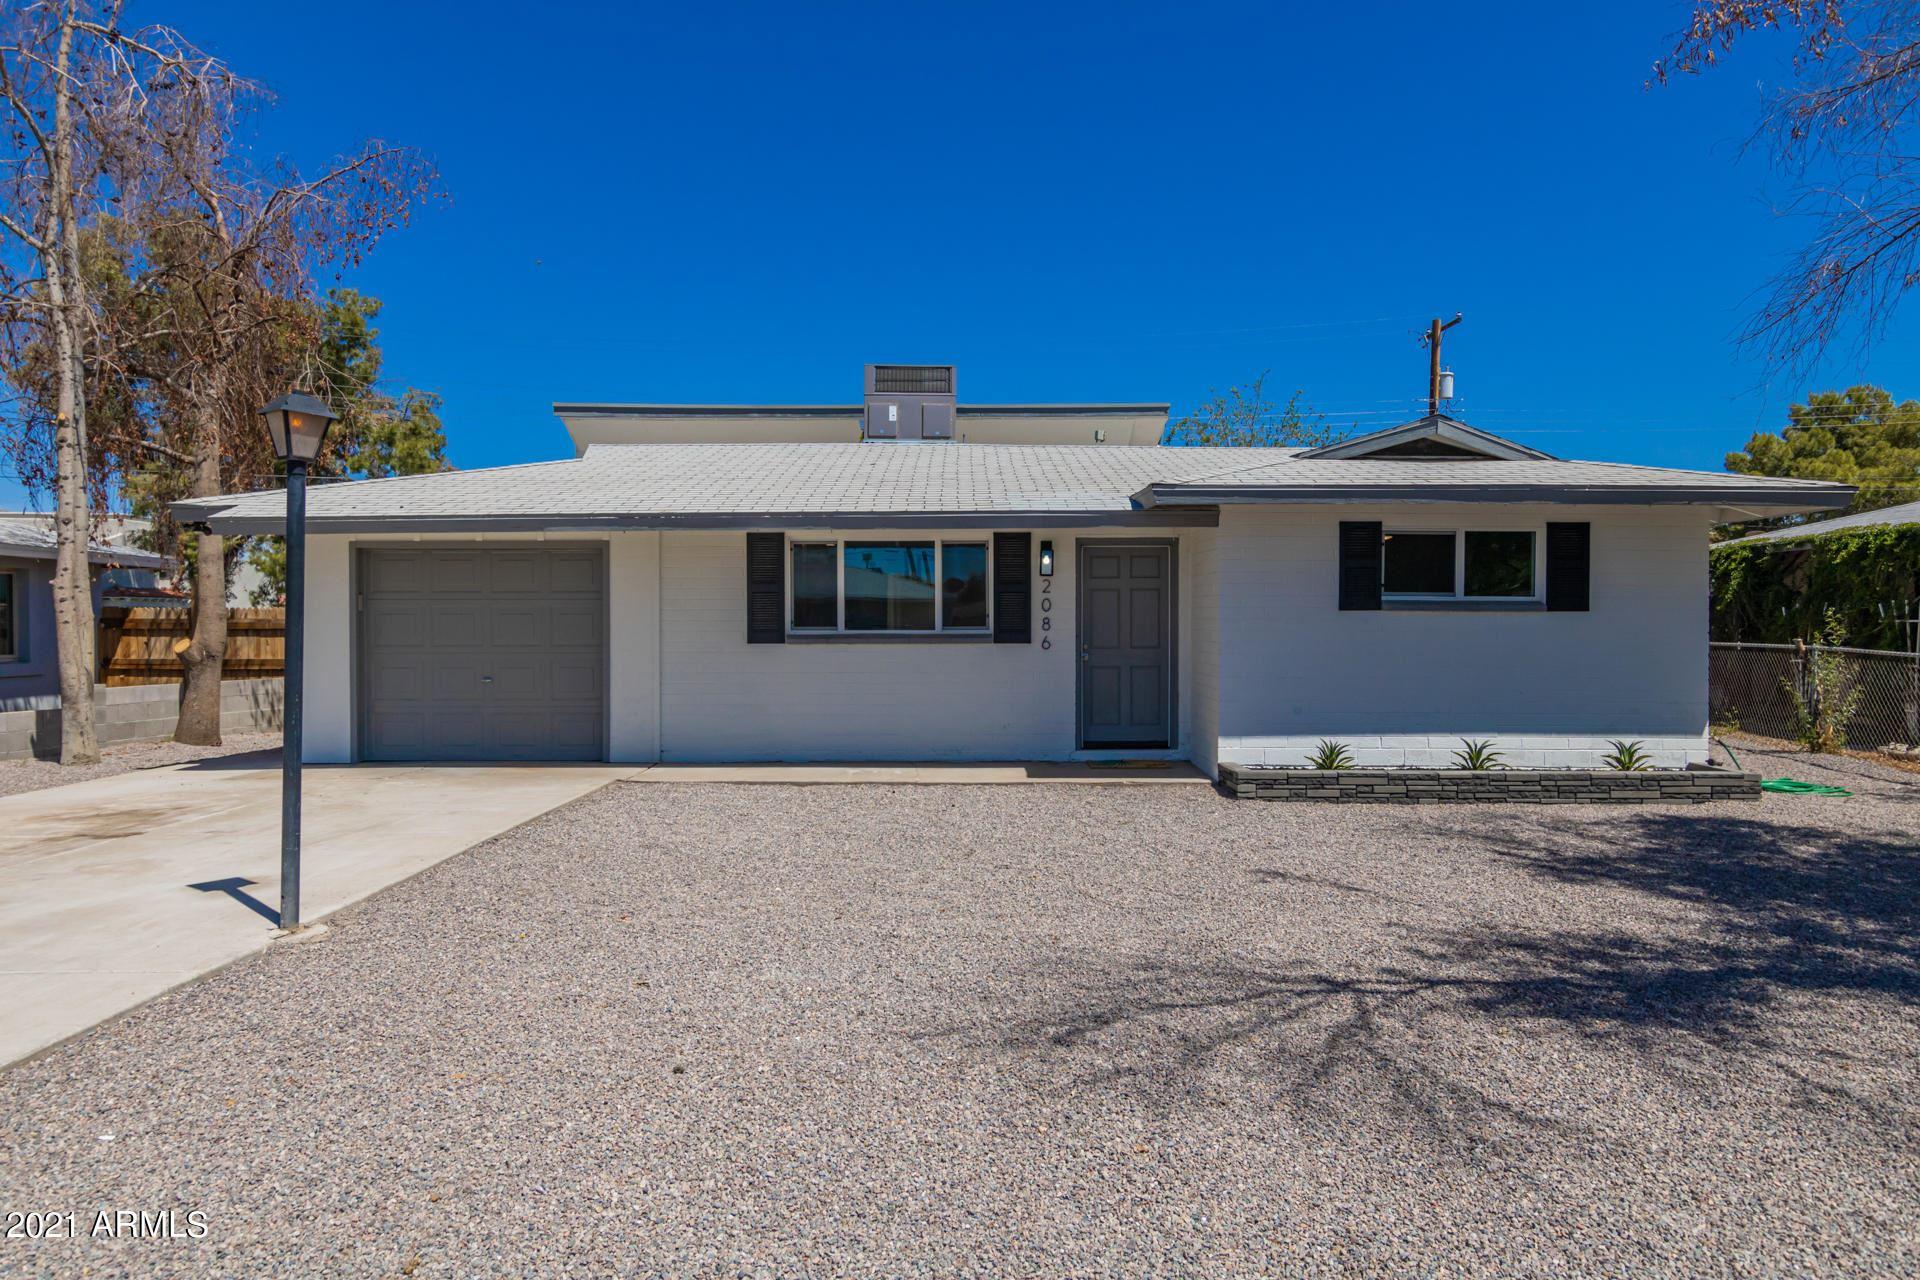 2086 E 10TH Street, Tempe, AZ 85281 - MLS#: 6231642